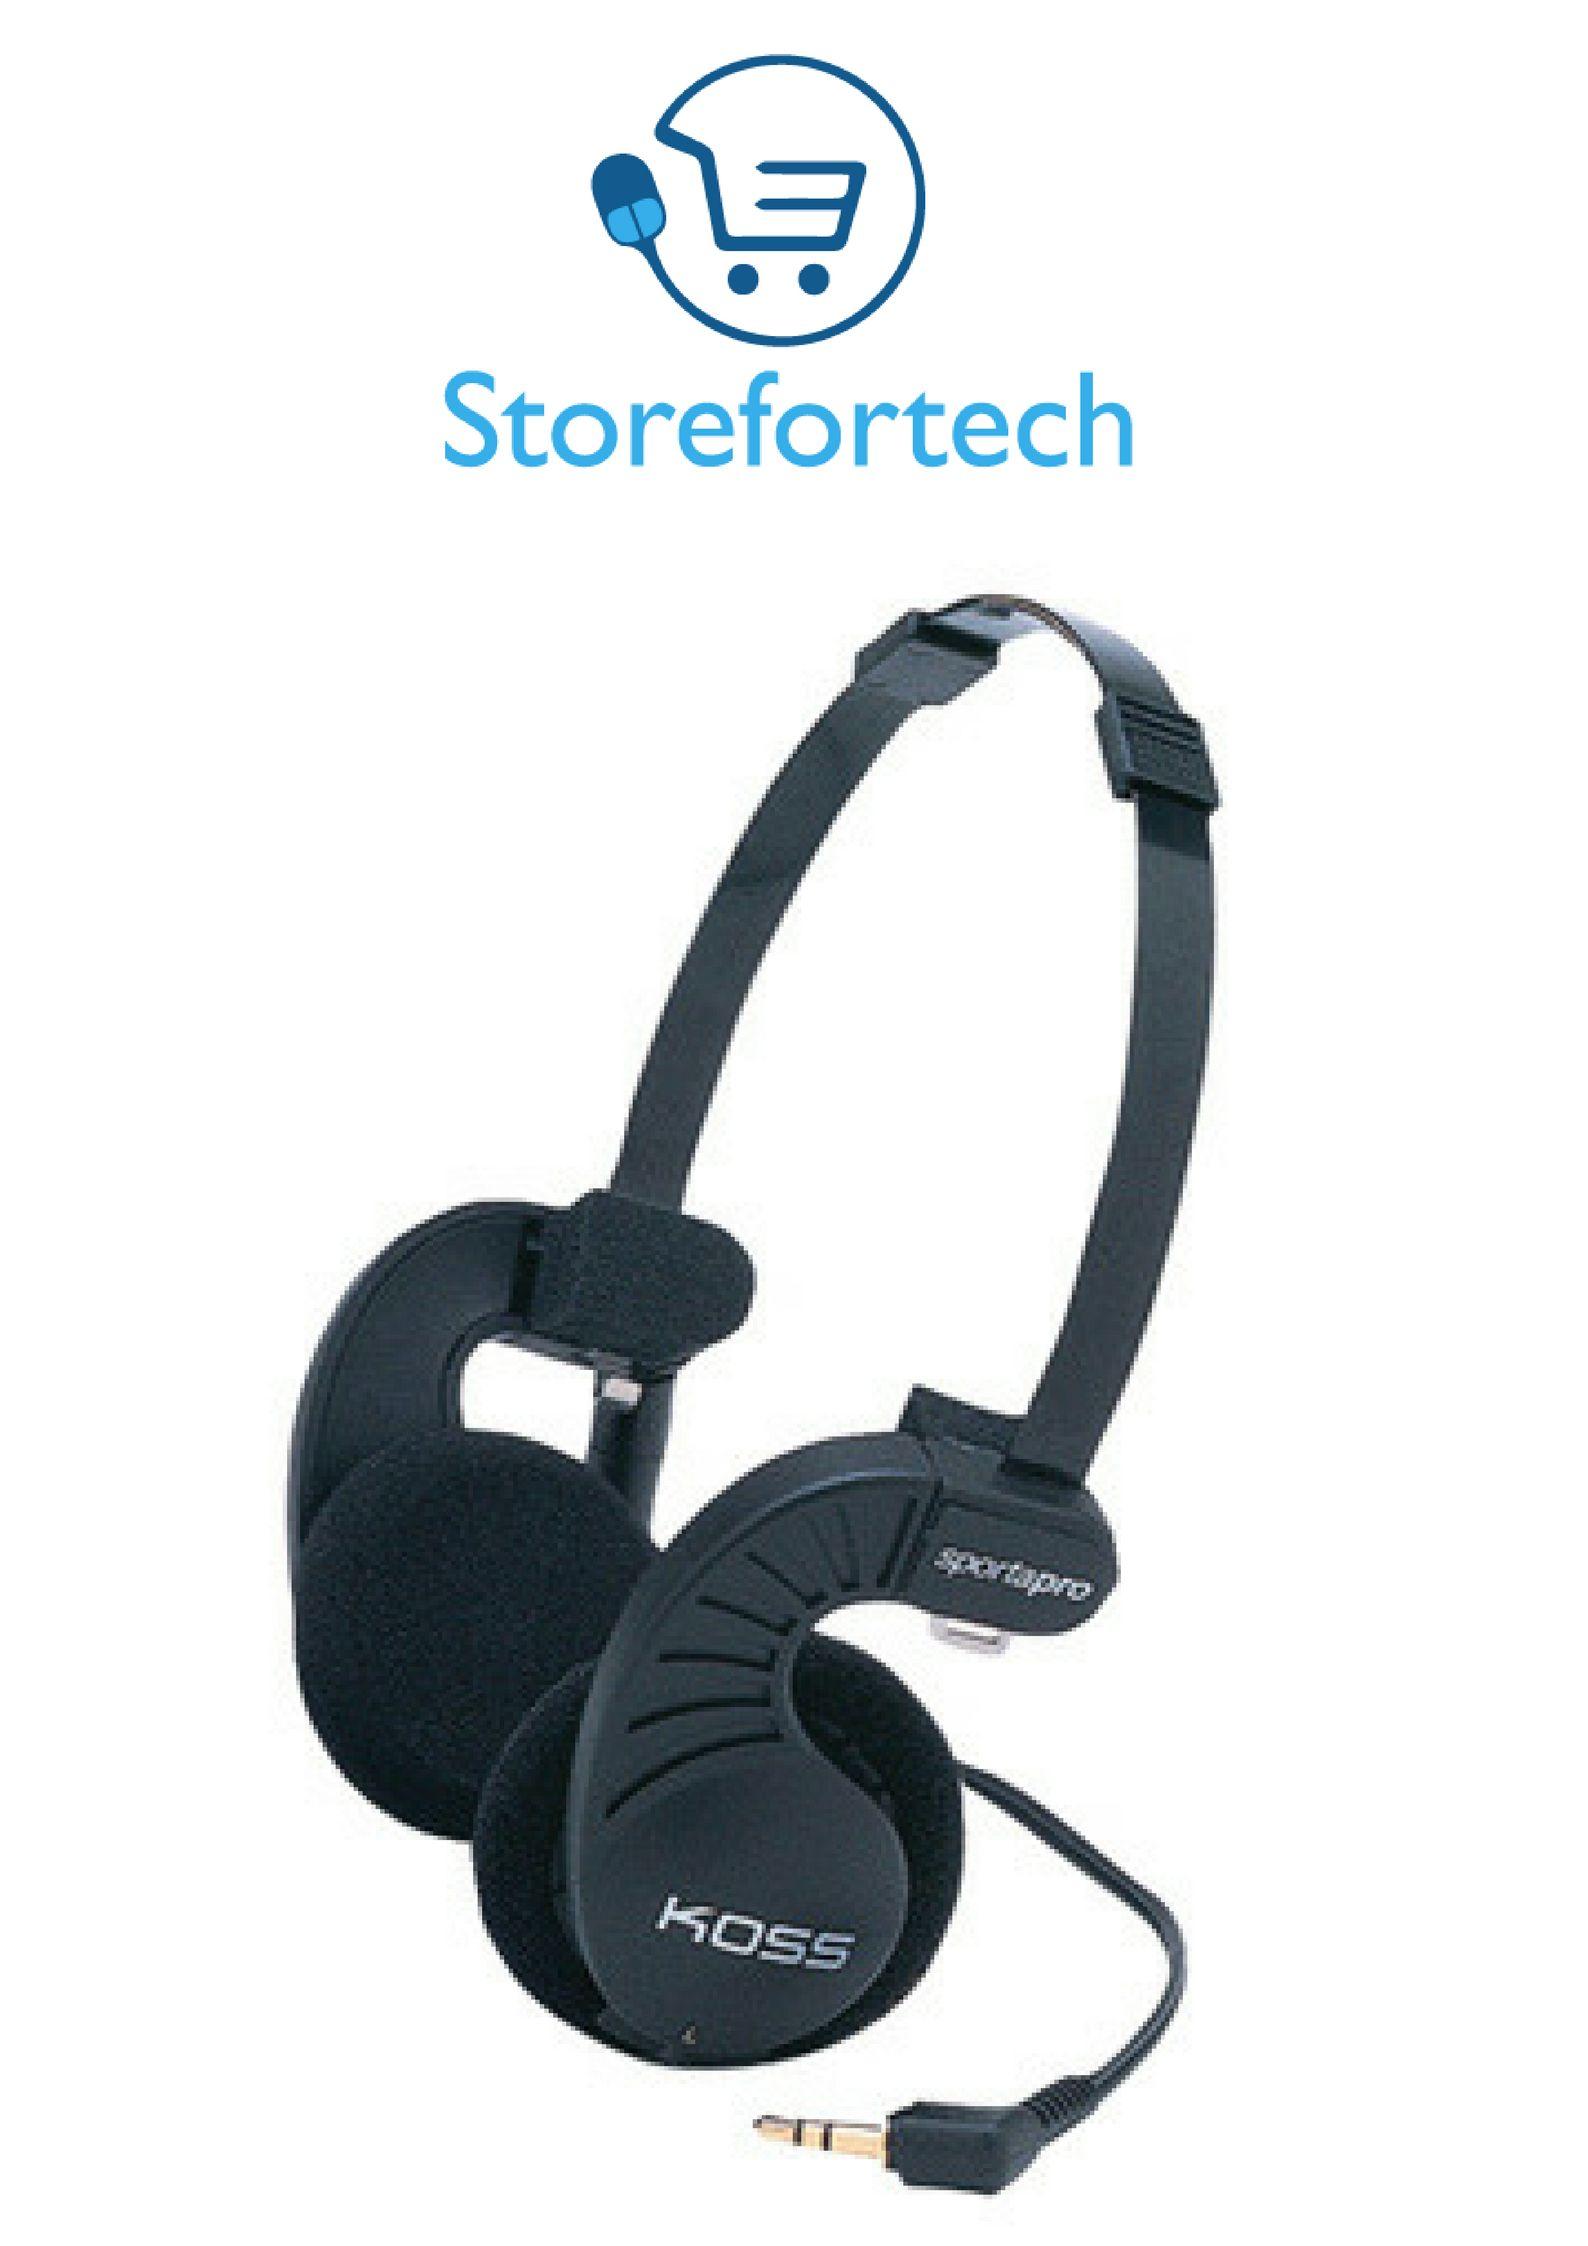 Get the perfect headphones smartphone mobilephone